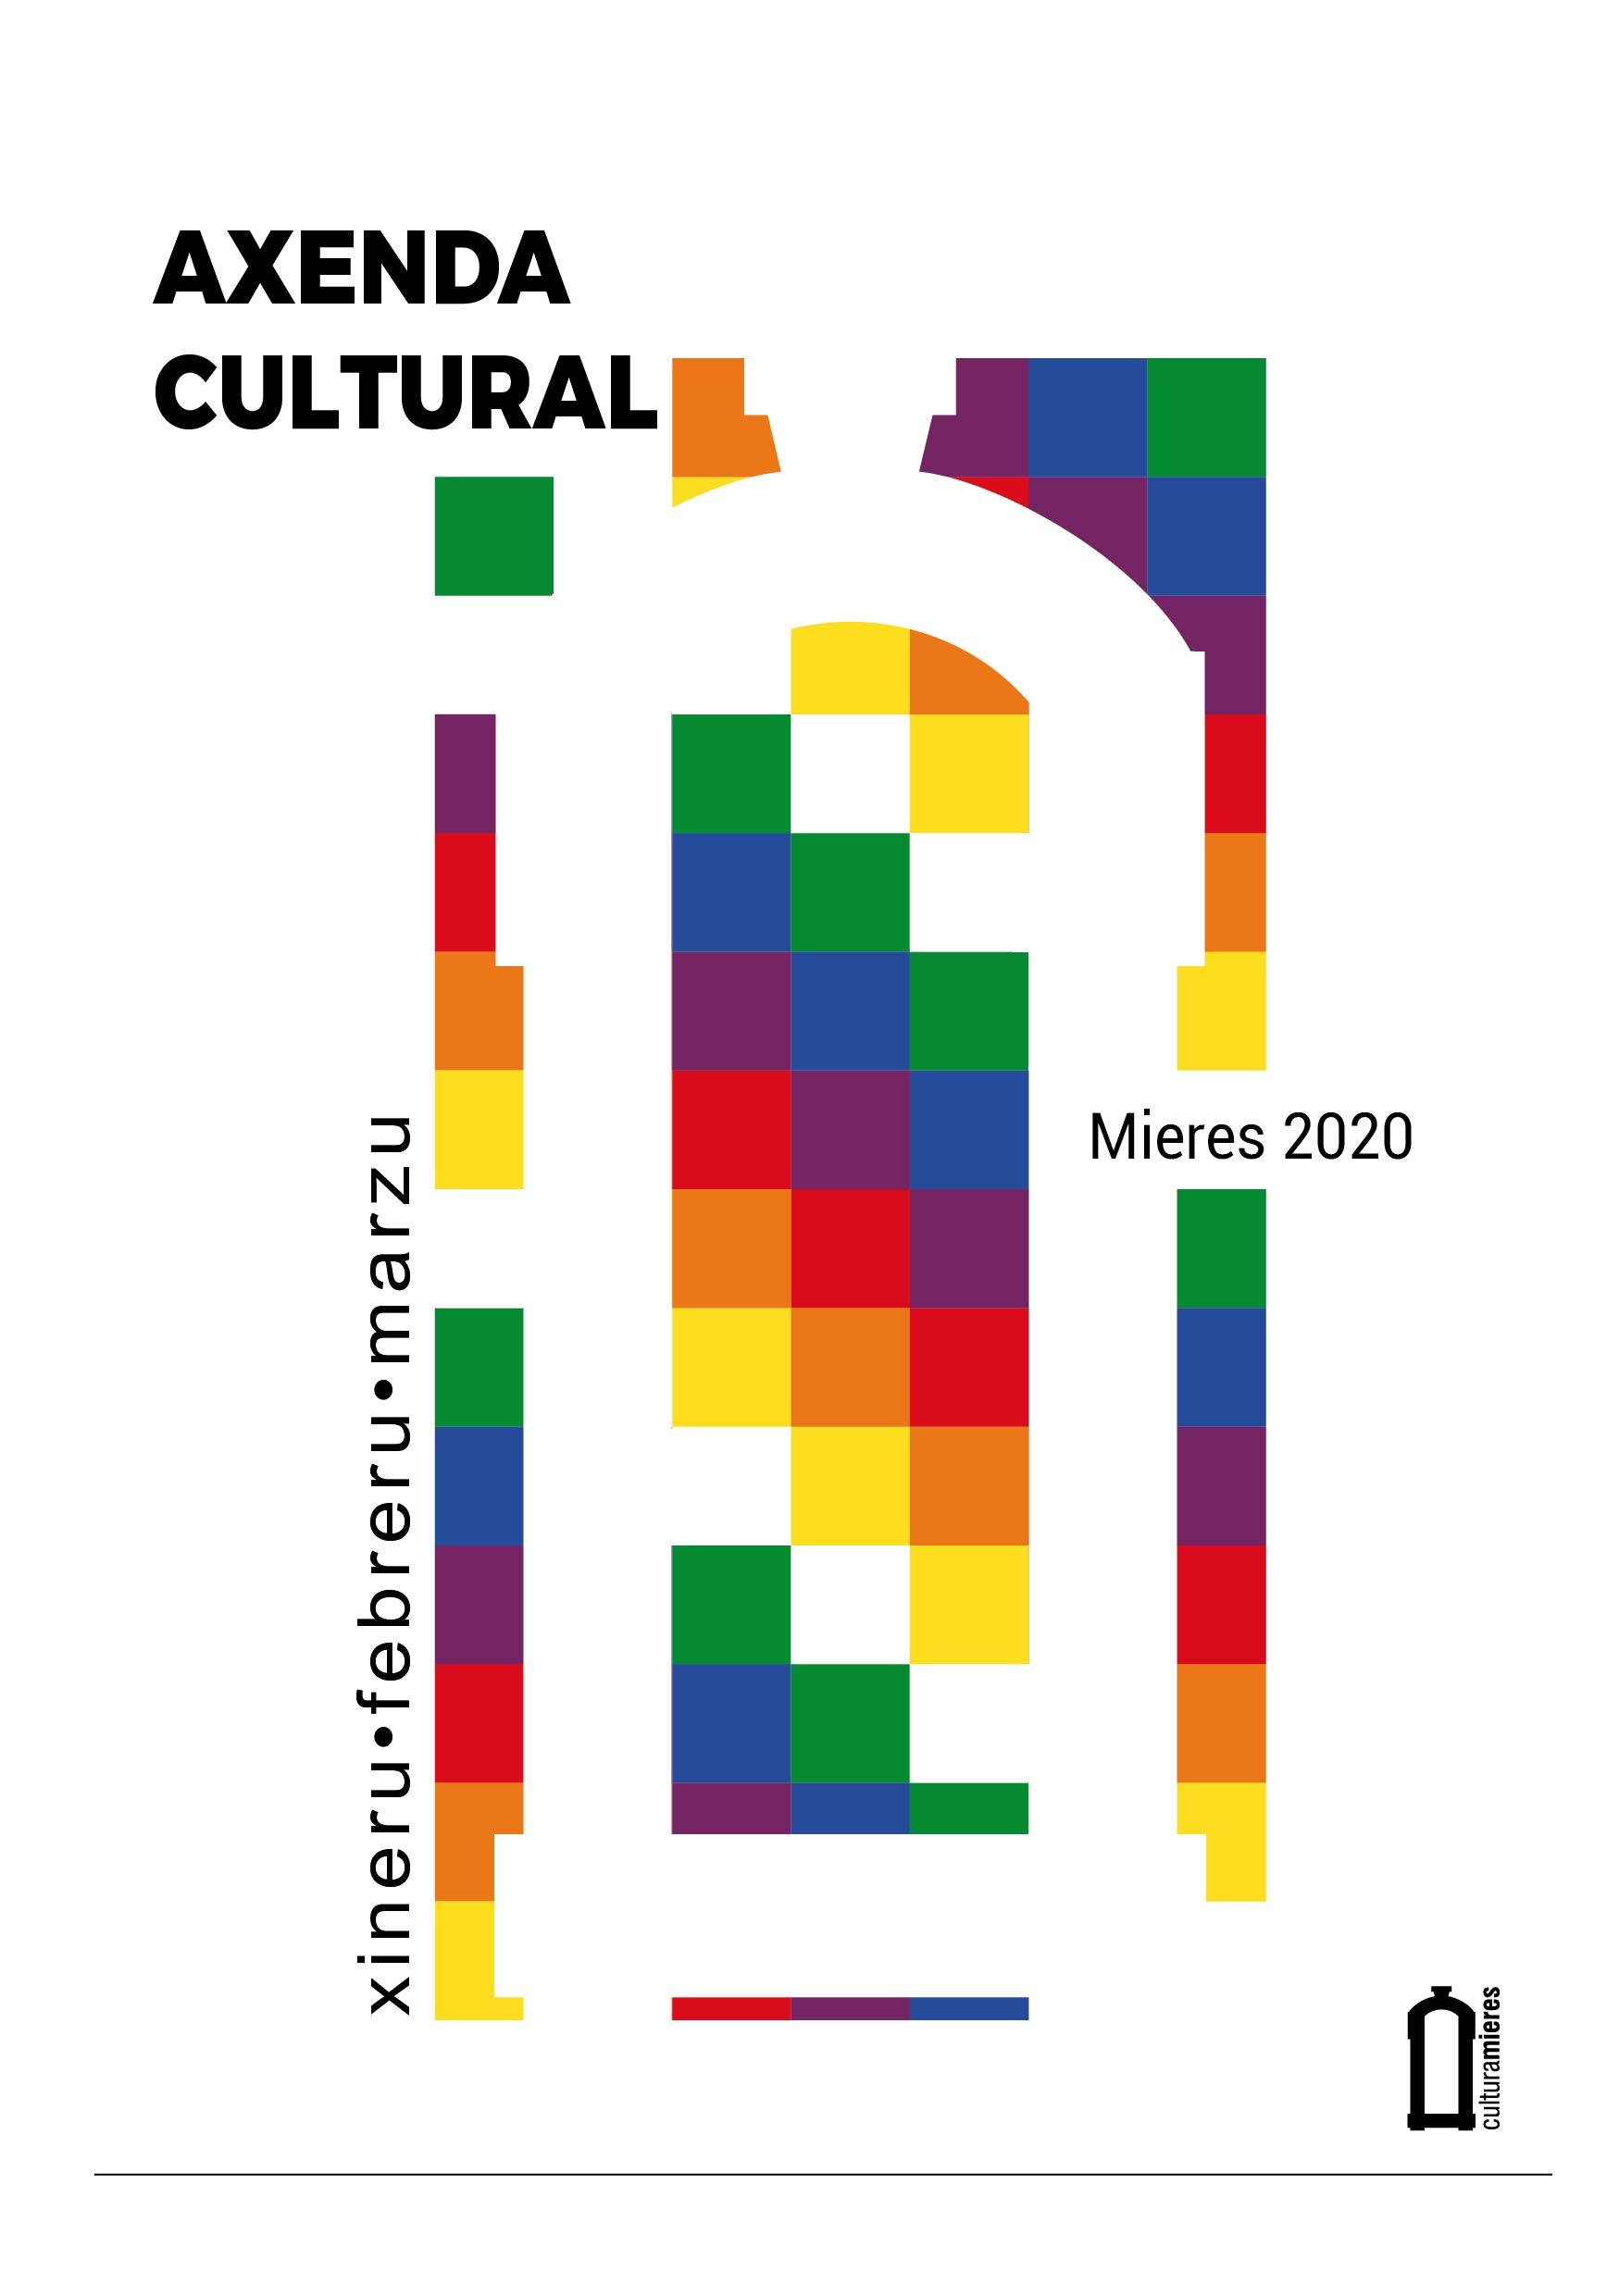 PORTADA AXENDA CULTURAL MIERES XINERU MARZU 2020 01